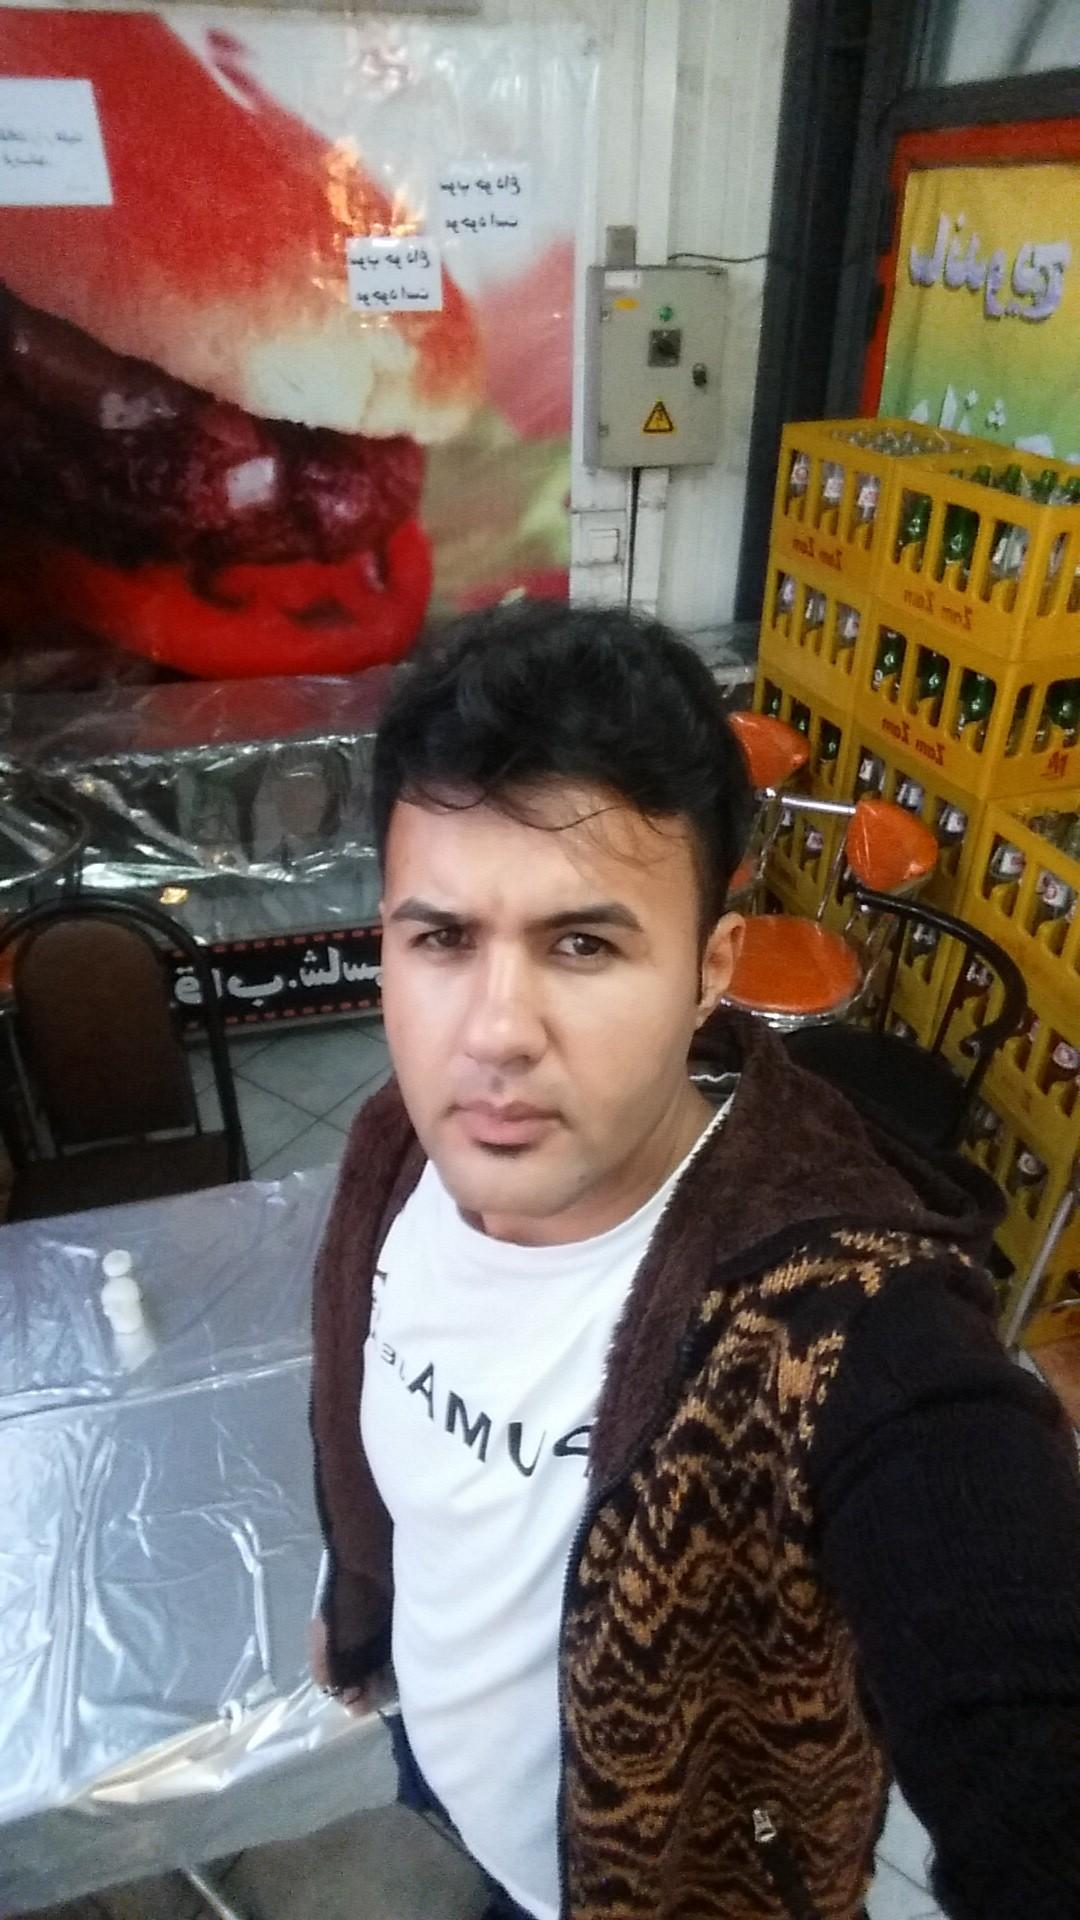 http://s6.picofile.com/file/8245016026/20160106_155416.jpg